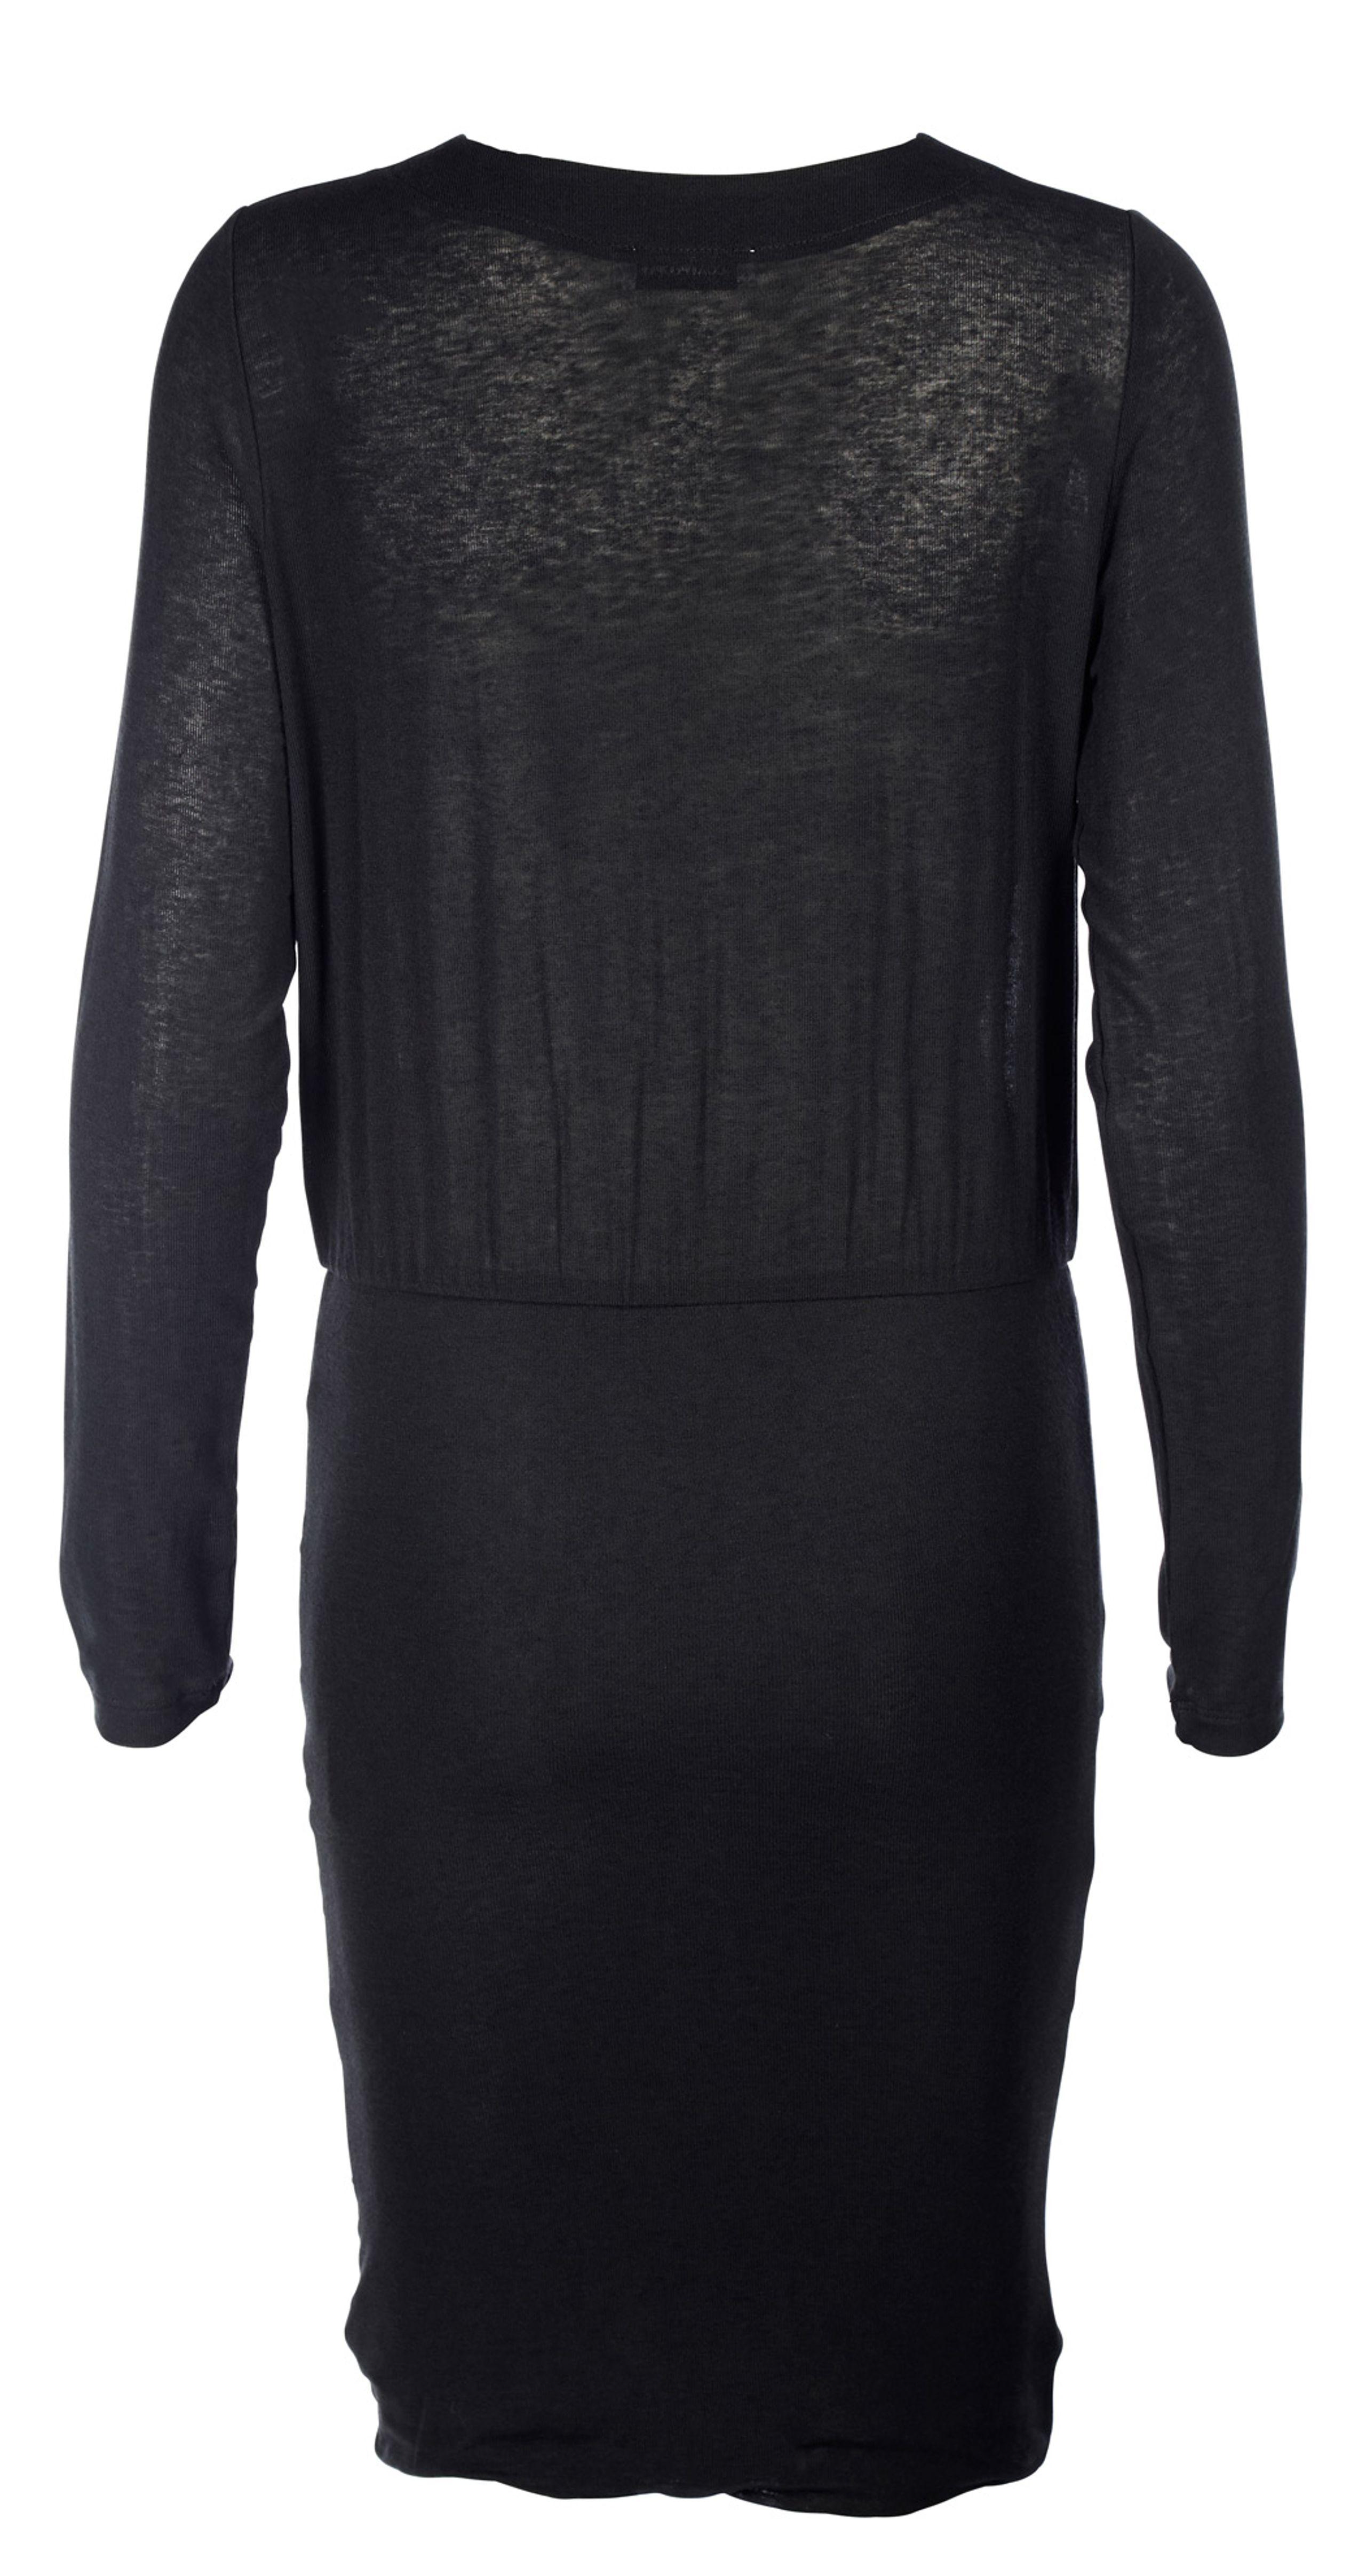 Knit Stig P Evie Evie Knit Dress Dress XFt7aw